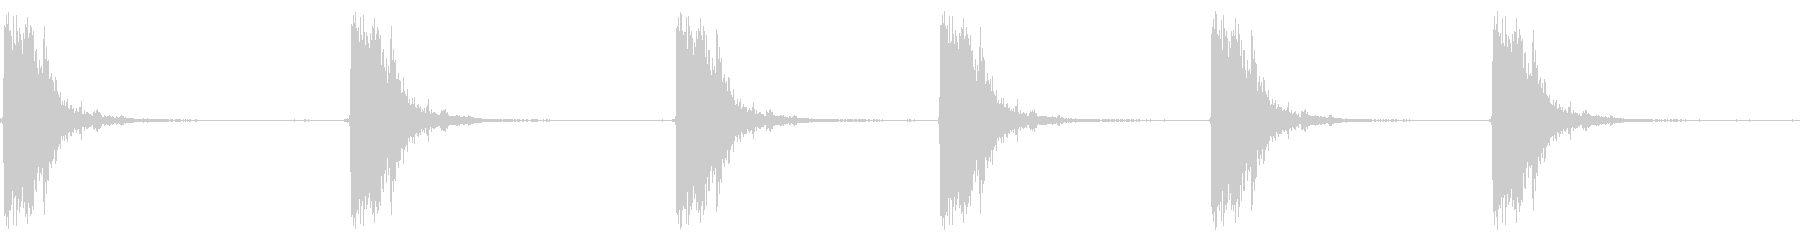 Shotgun Fire Loopの未再生の波形